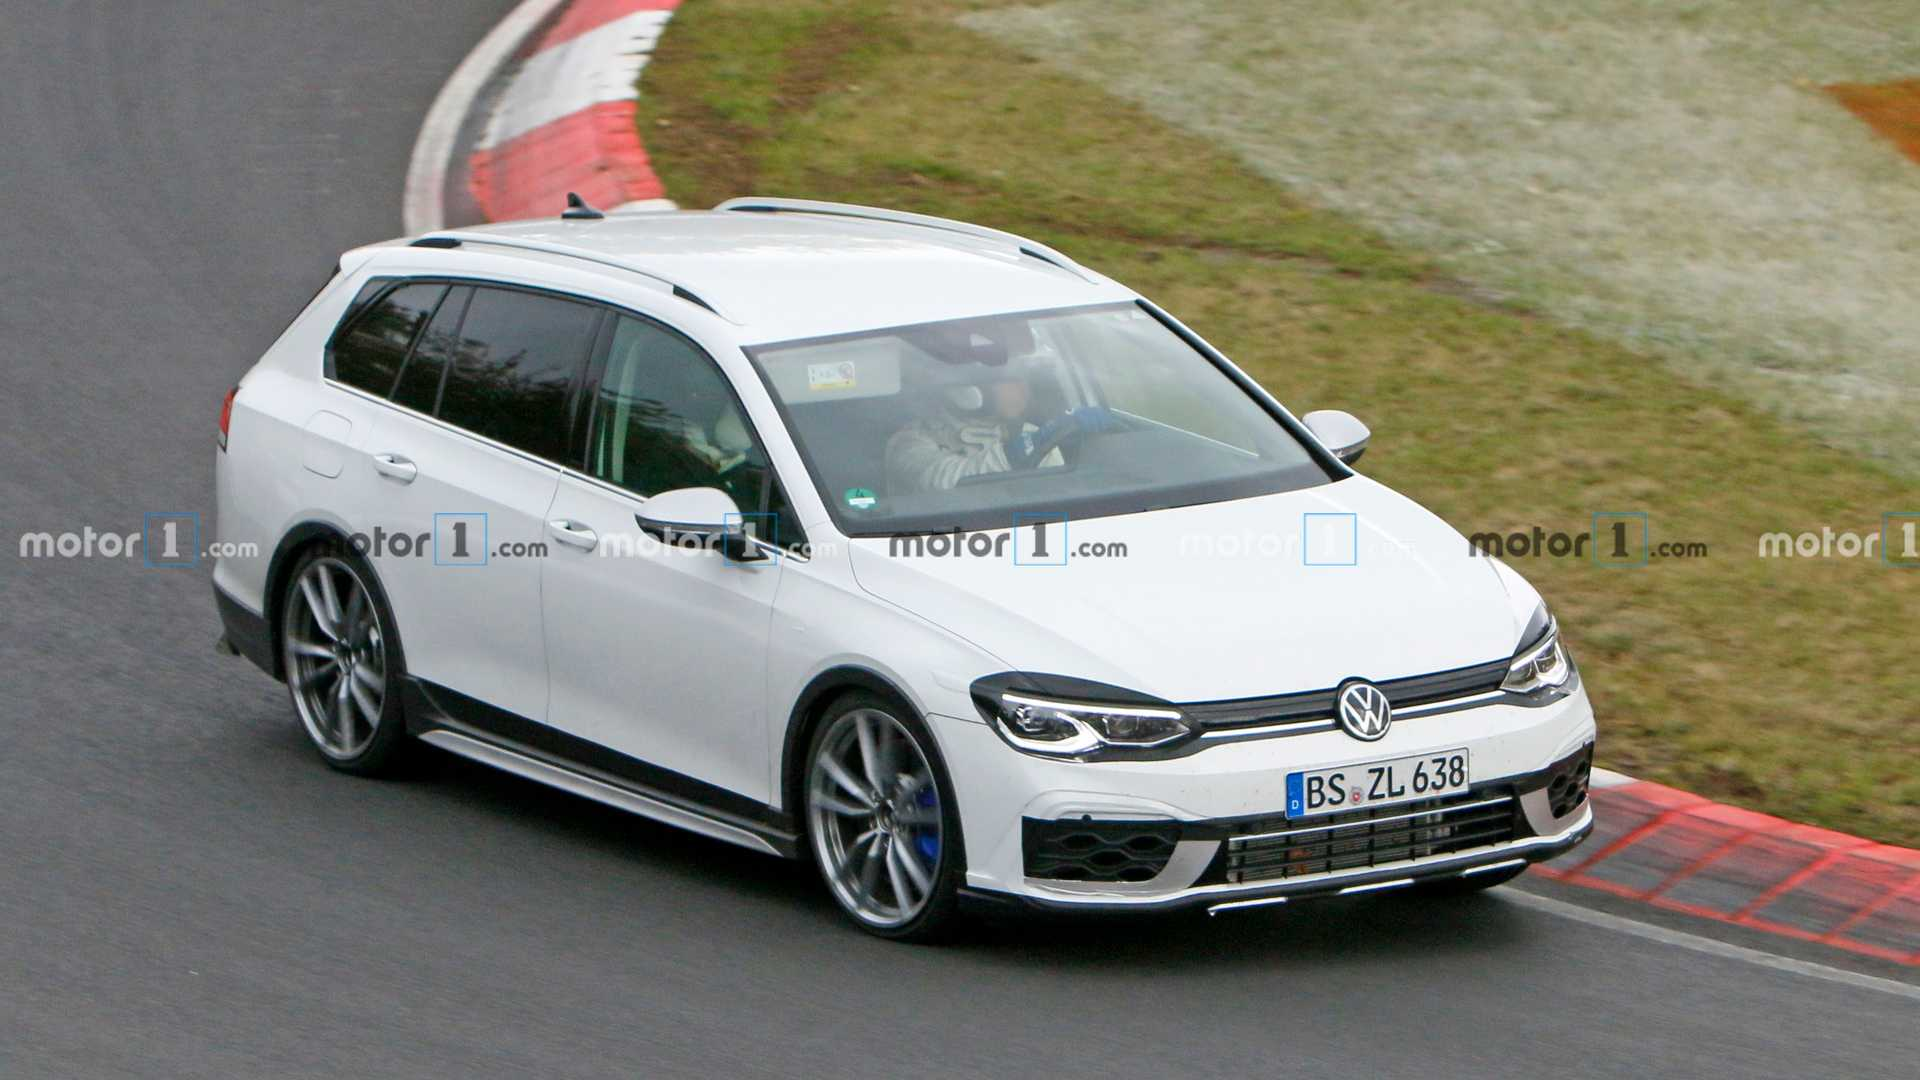 Volkswagen Golf R Variant bu kez de Nürburgring'de görüntülendi